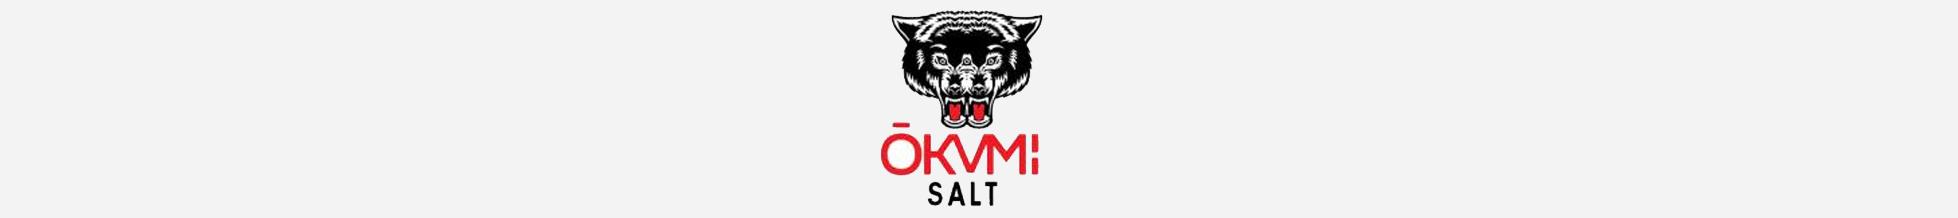 okvmi-salt.jpg